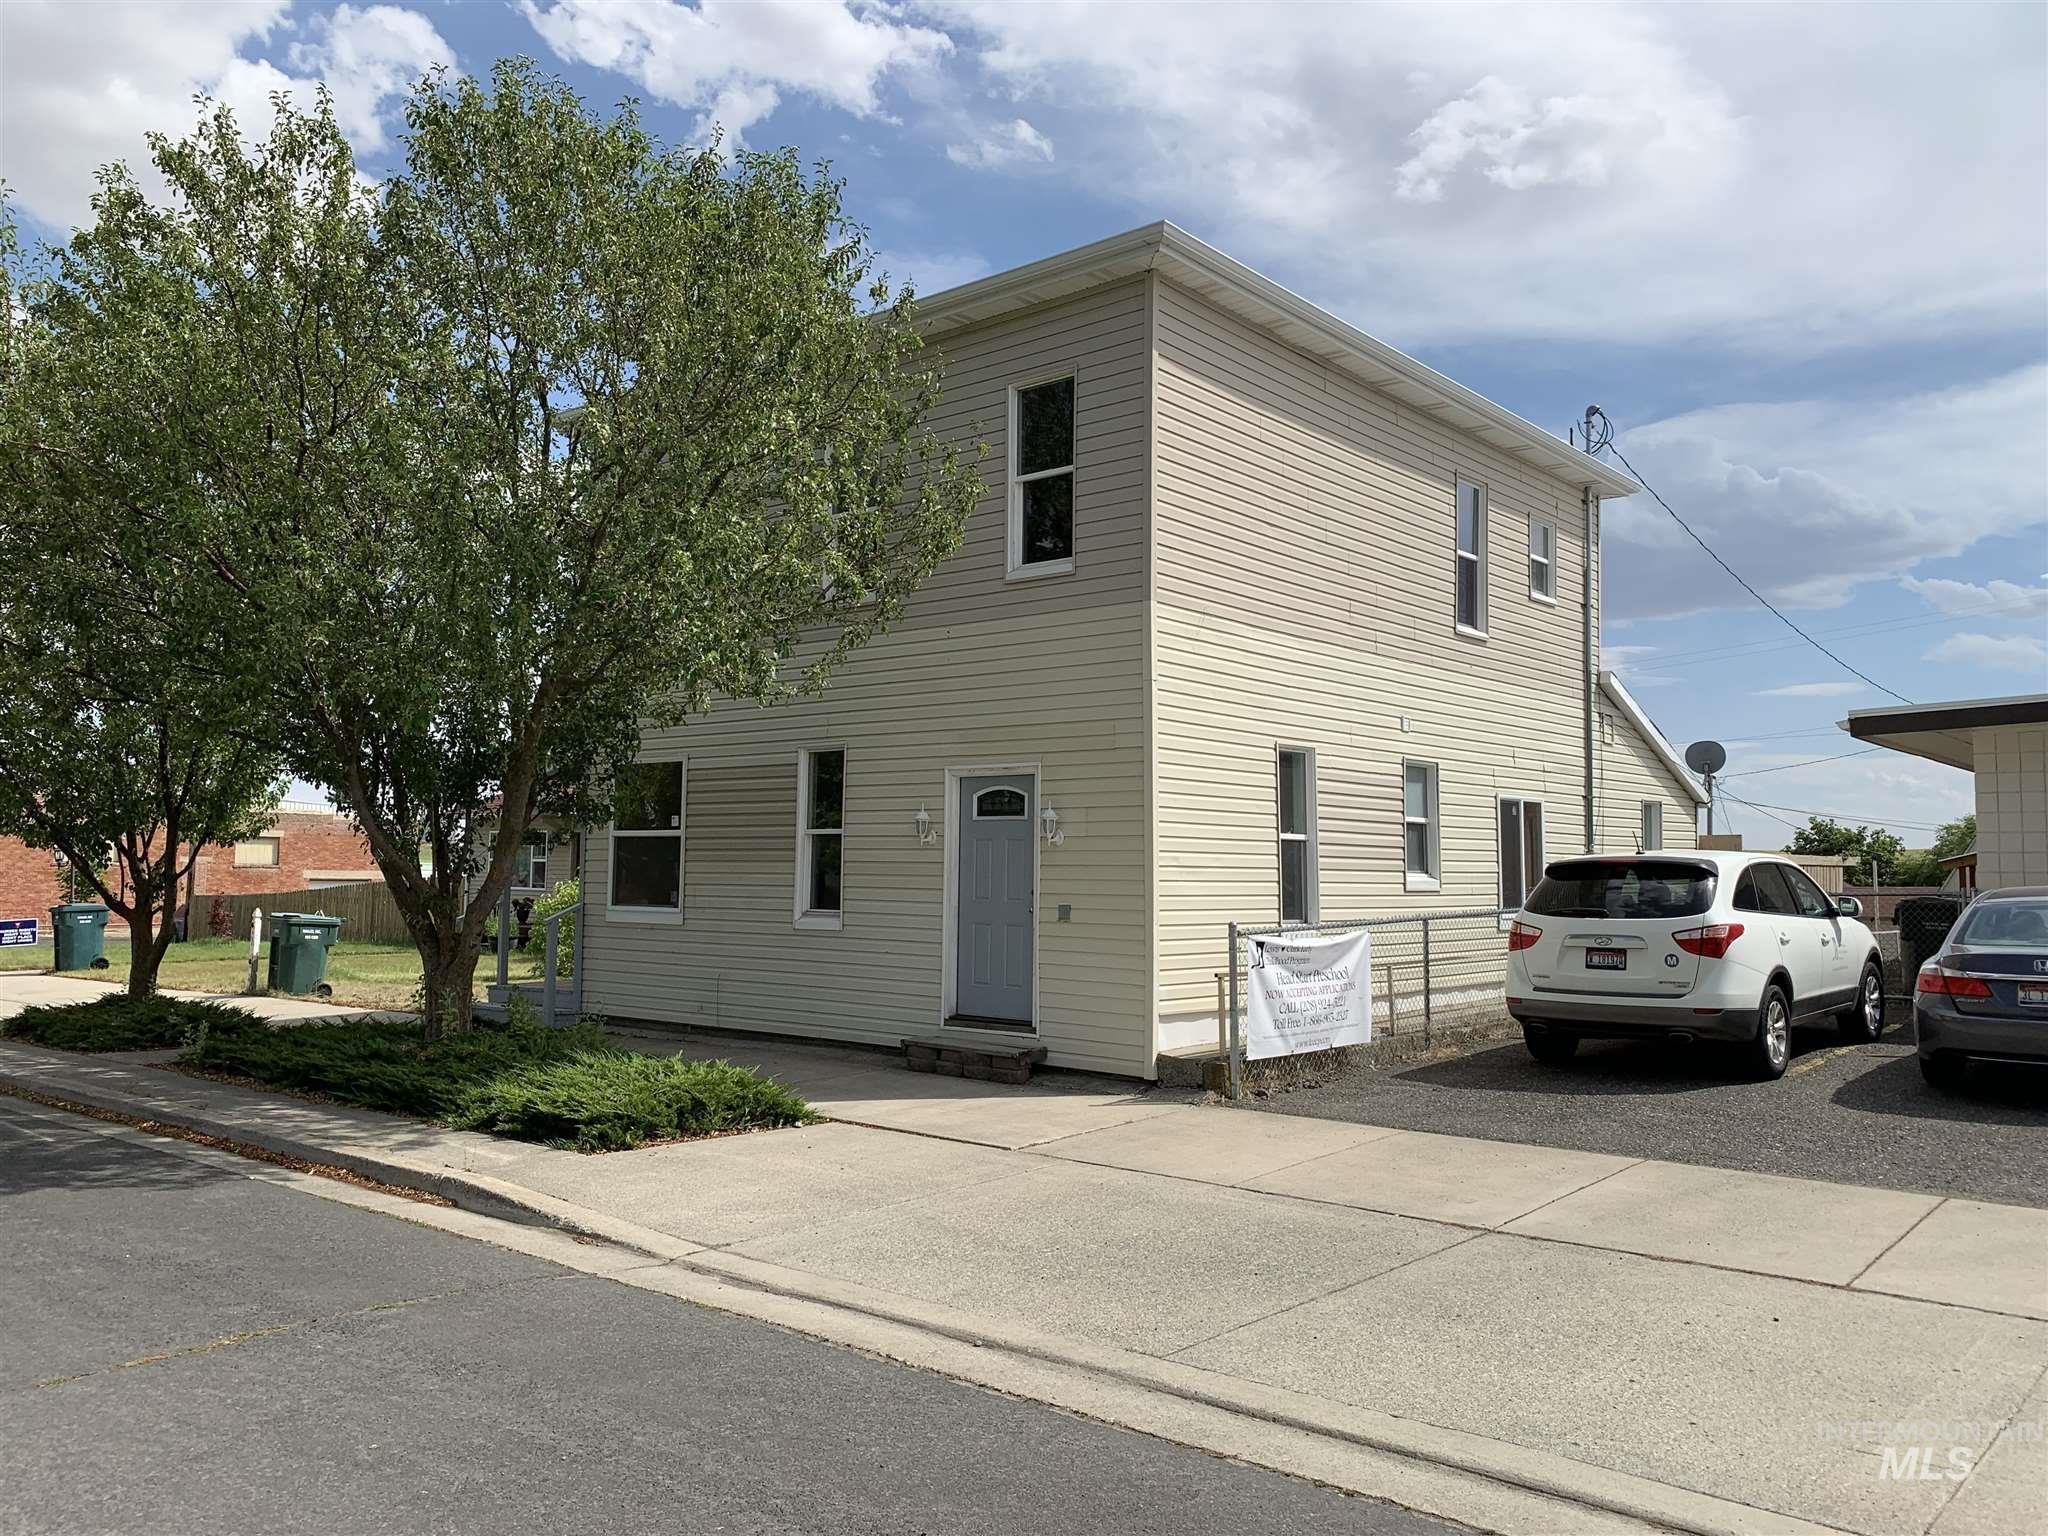 207 W Main Property Photo